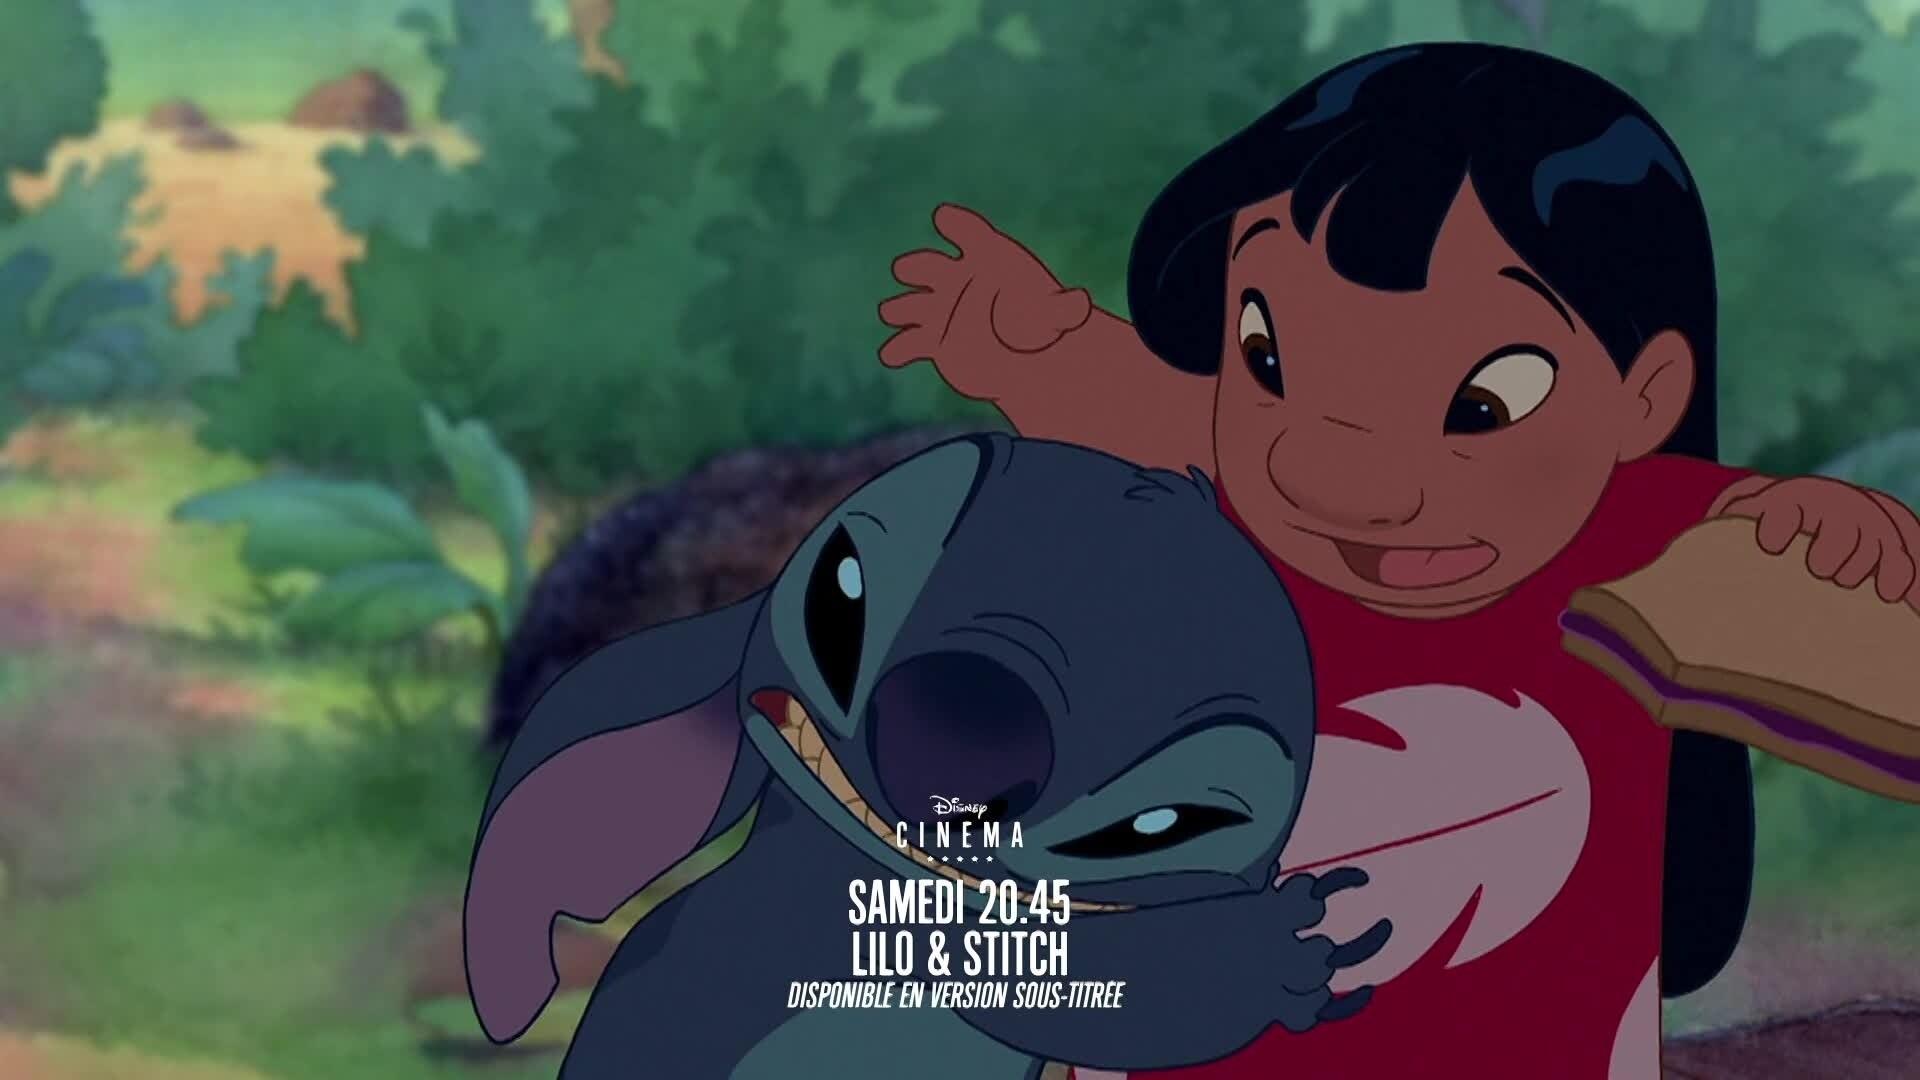 Samedi 11 février sur Disney Cinema